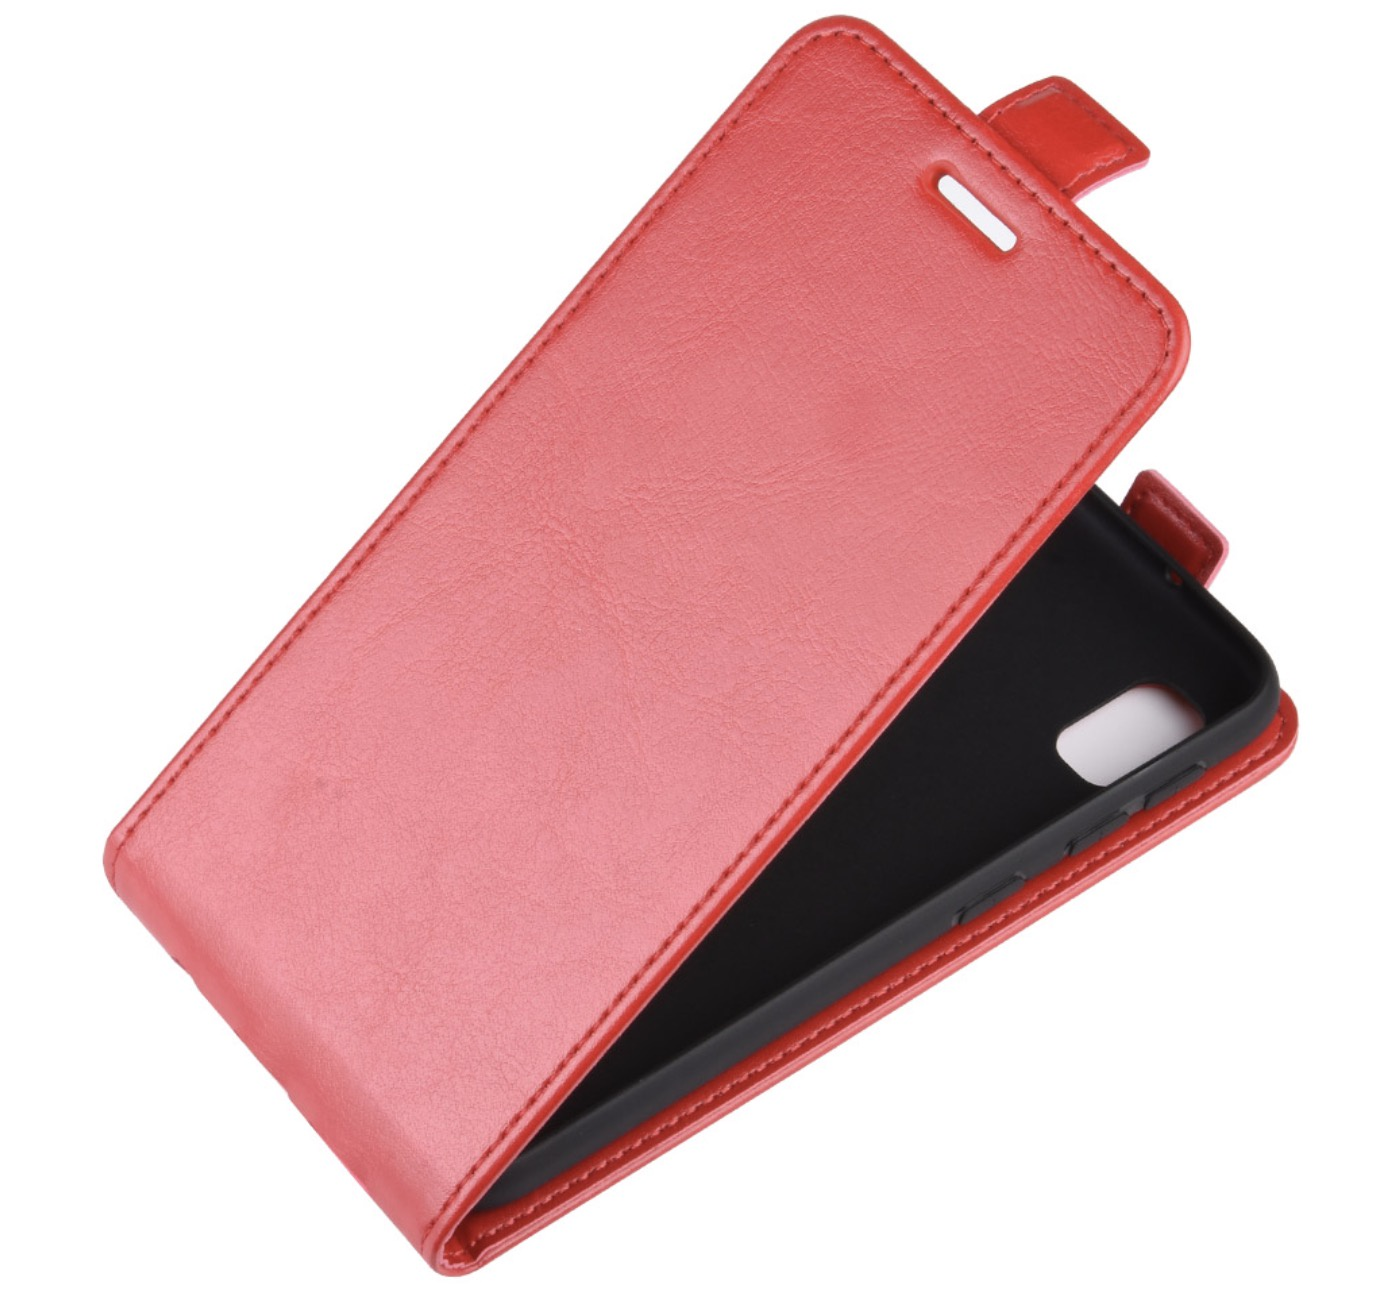 Фото - Чехол-флип MyPads для LG G6 mini / LG Q6 / LG Q6 Plus / LG Q6a M700 вертикальный откидной красный lg 65uj634v